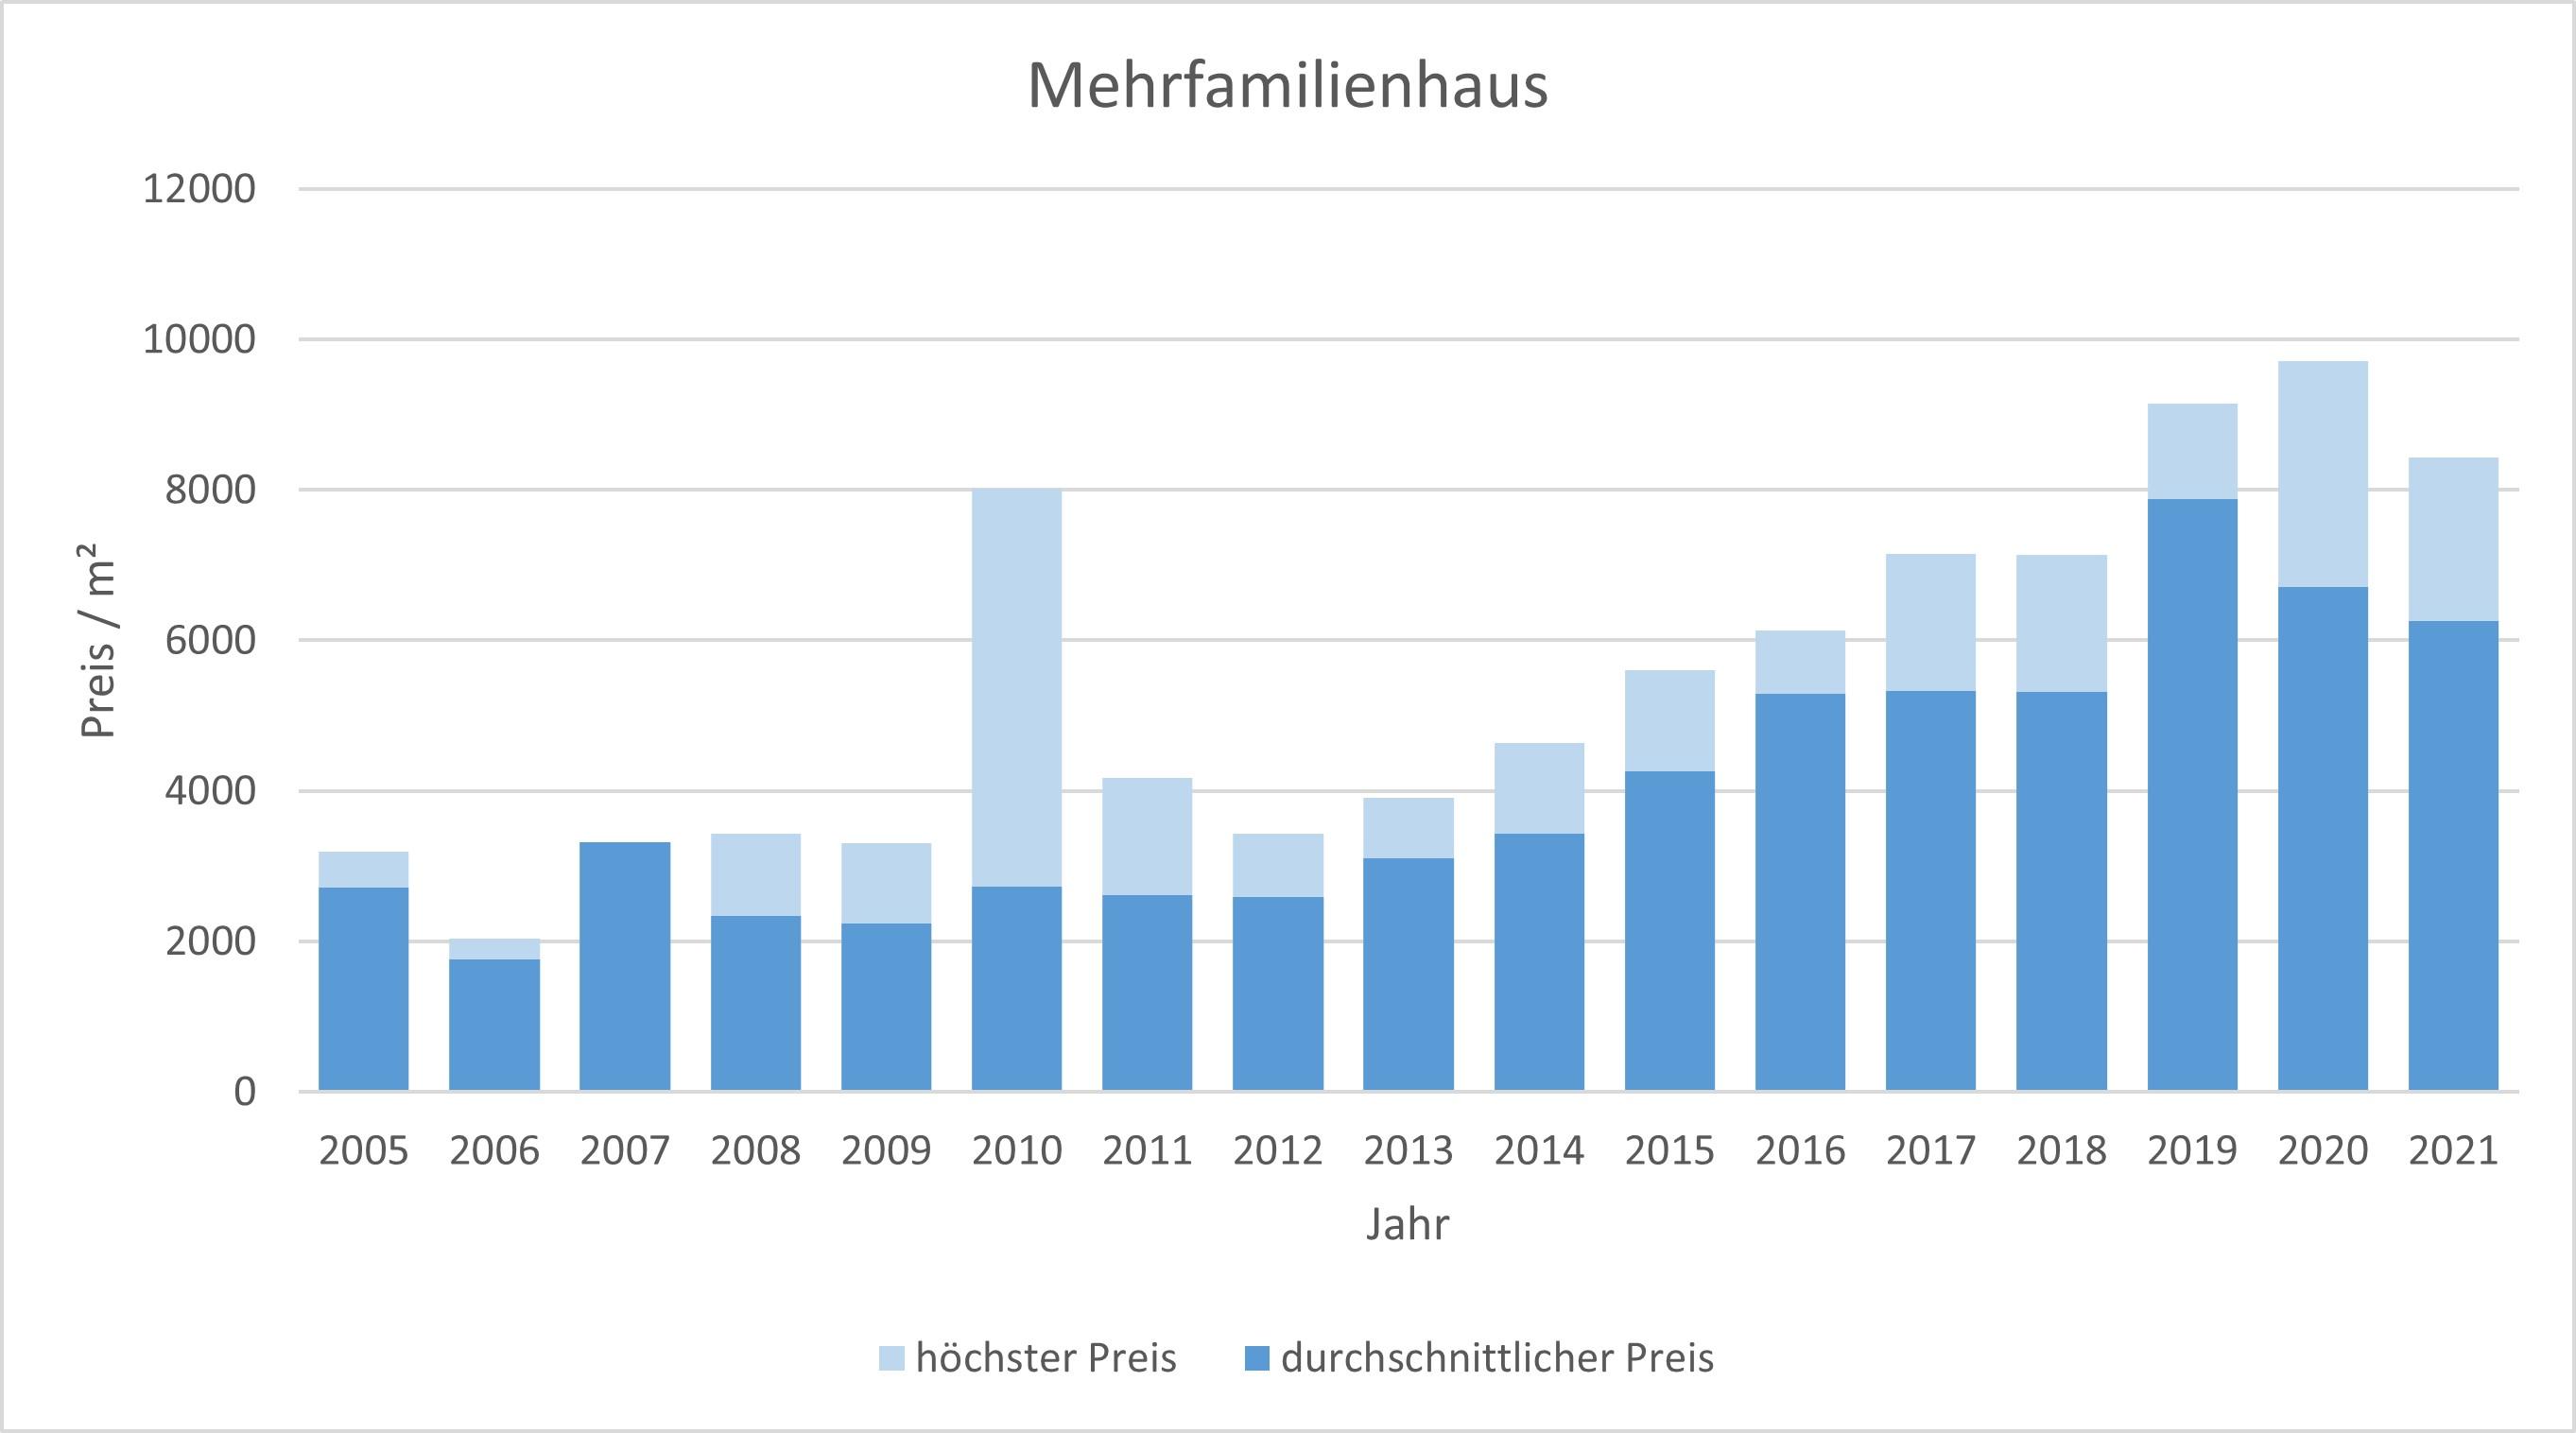 Germering Mehrfamilienhaus kaufen verkaufen Preis Bewertung  2019 2020 2021 Makler www.happy-immo.de